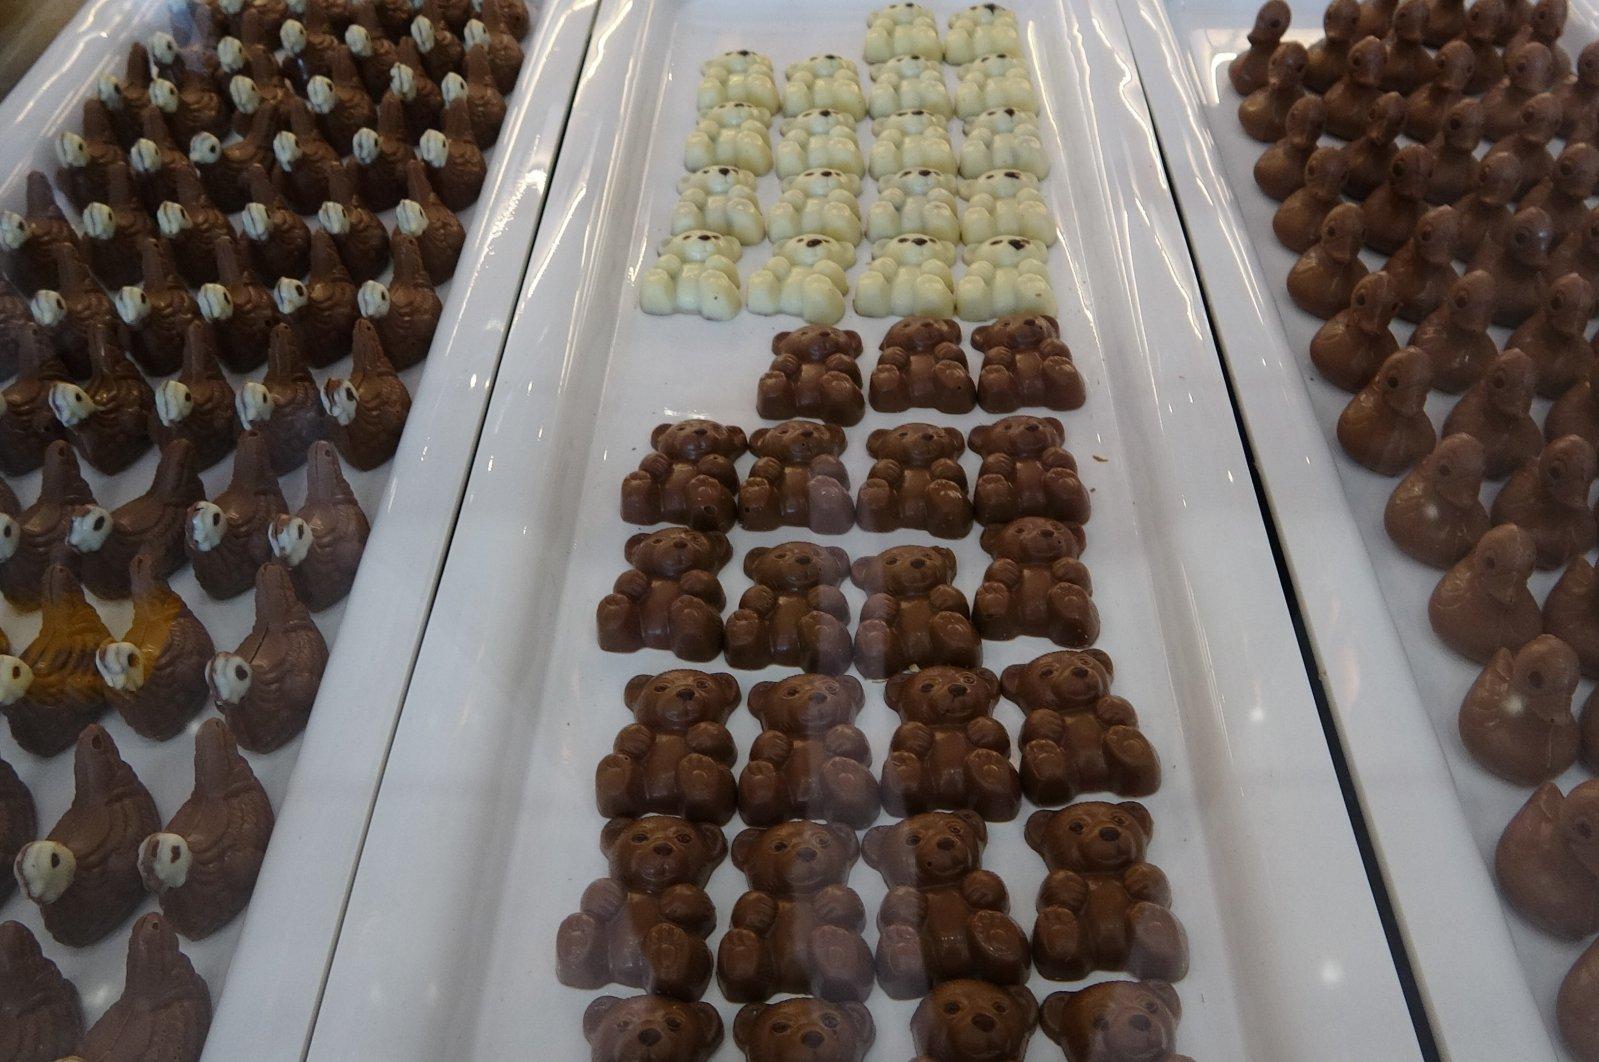 Chocolate on display at a chocolate museum, in Bursa, northwestern Turkey, July 10, 2021. (İHA PHOTO)